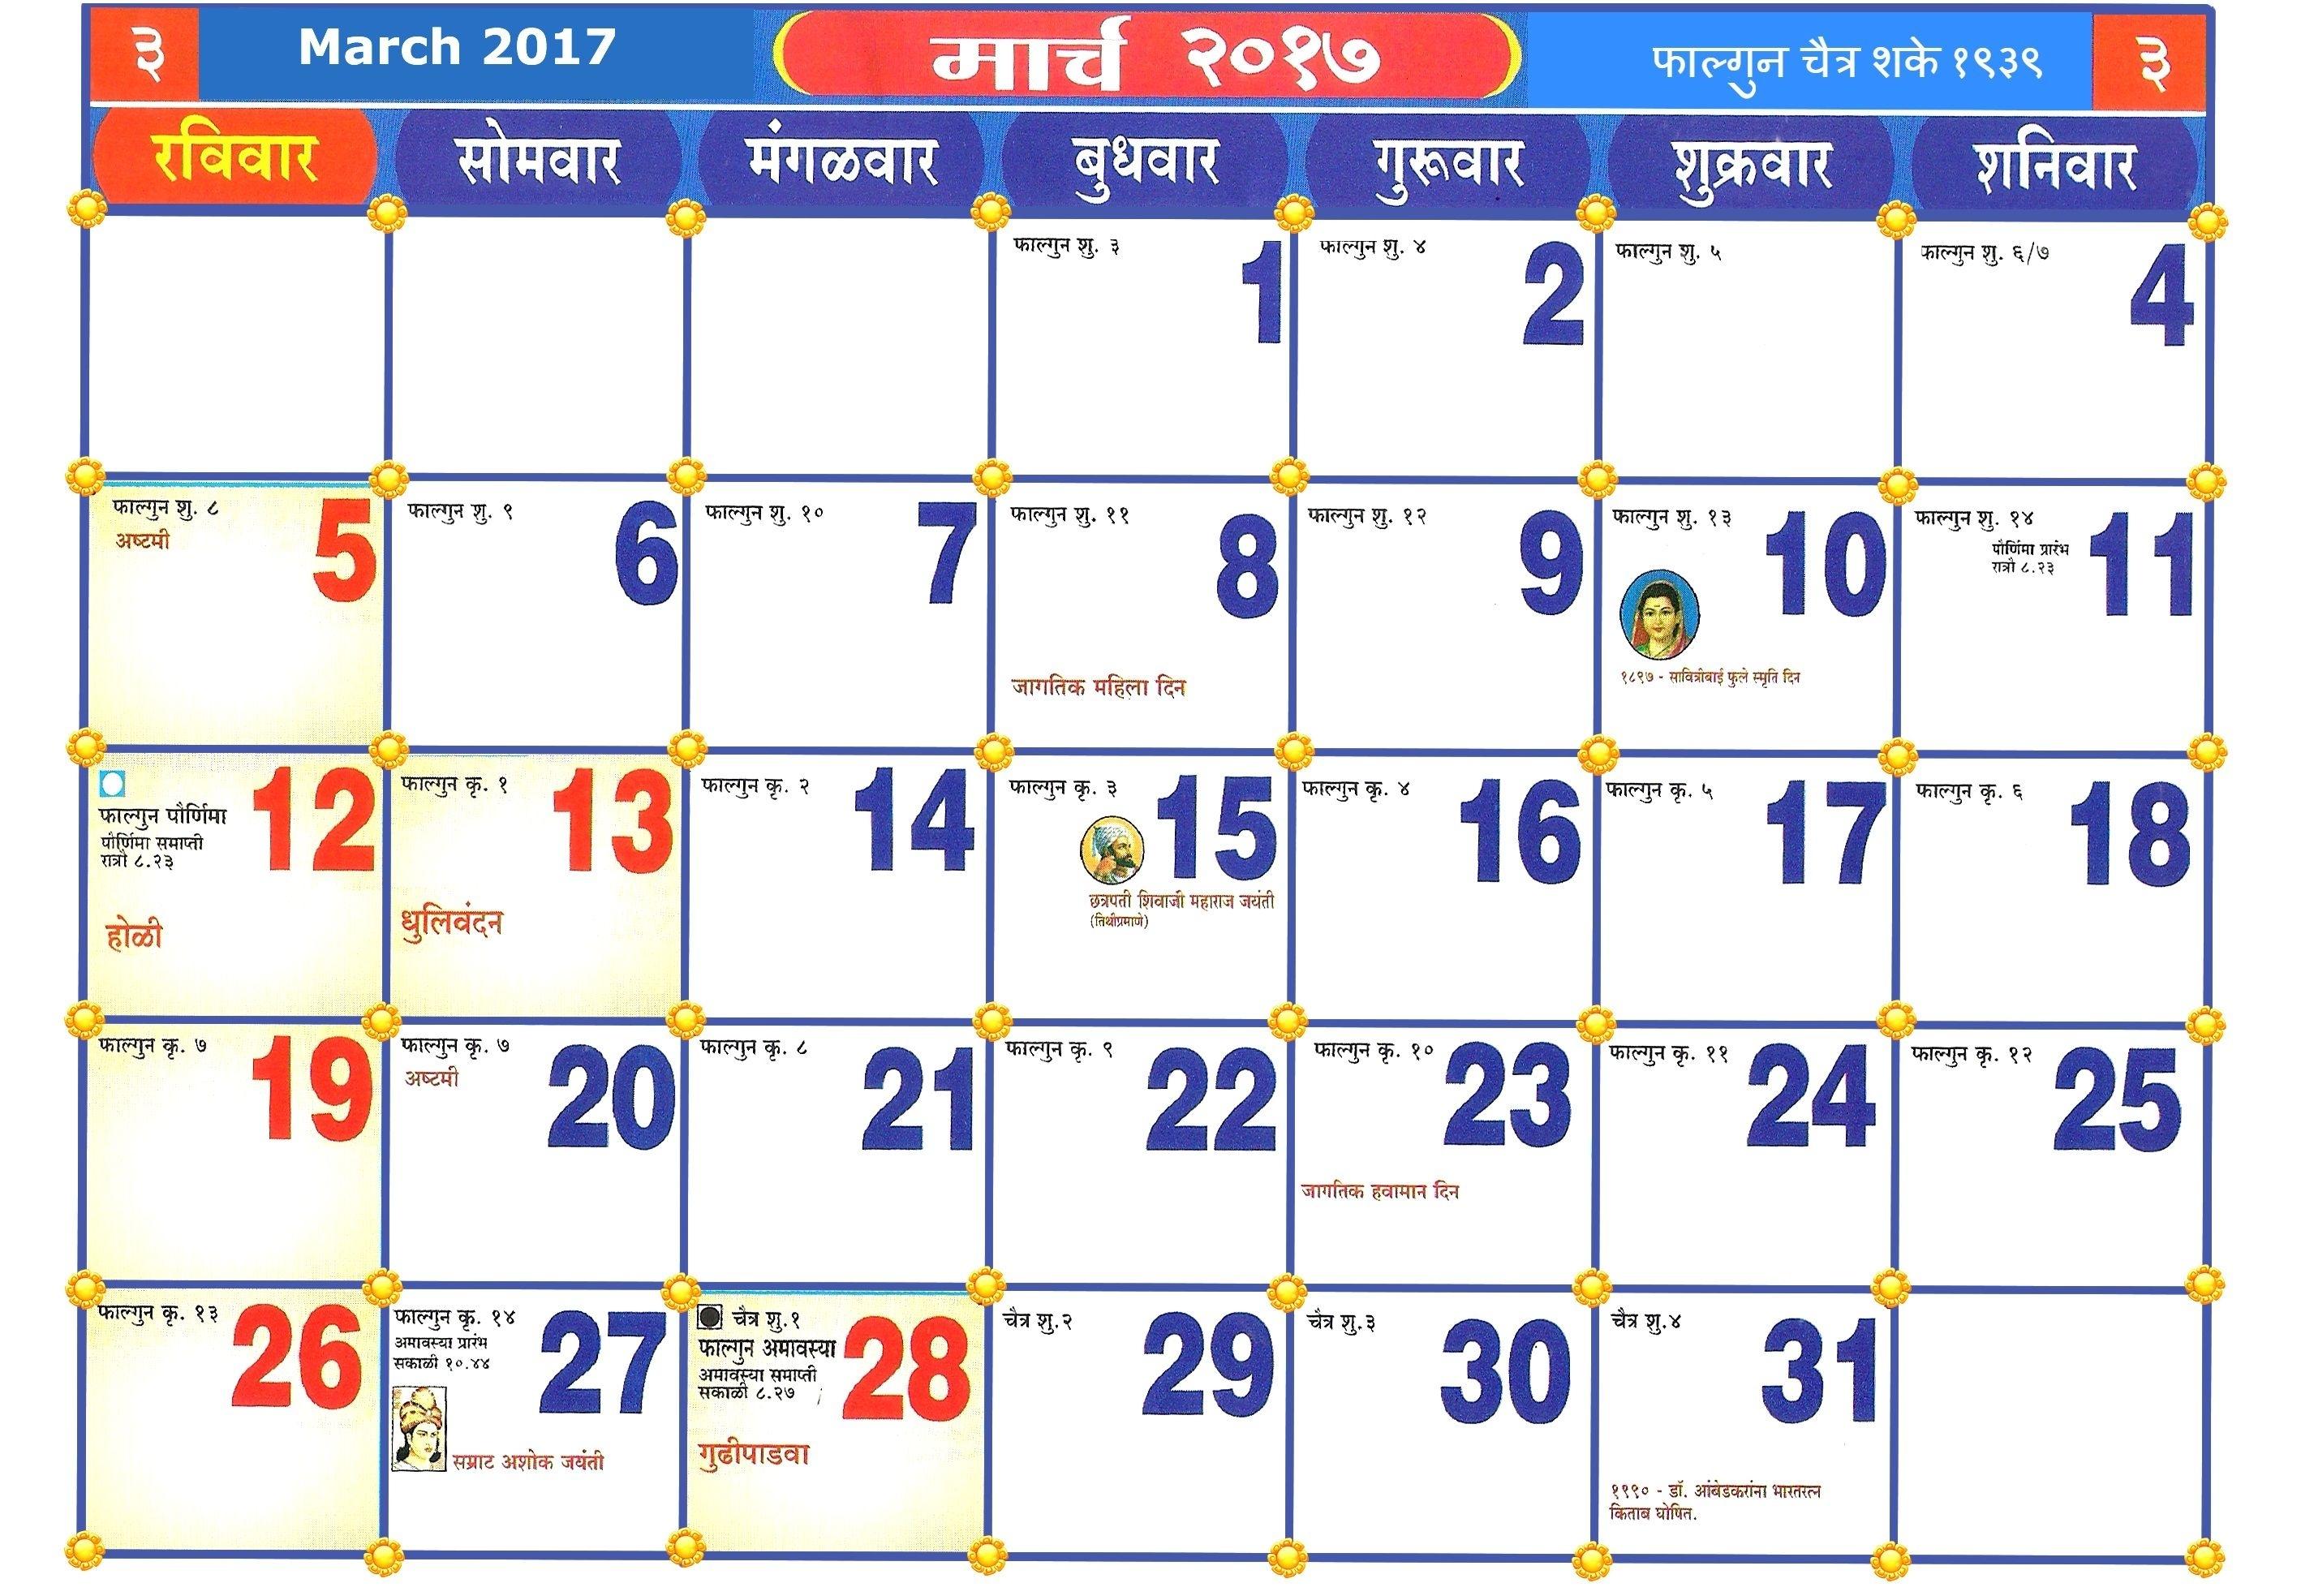 March 2019 Calendar Marathi | 2019 Calendar, Calendar